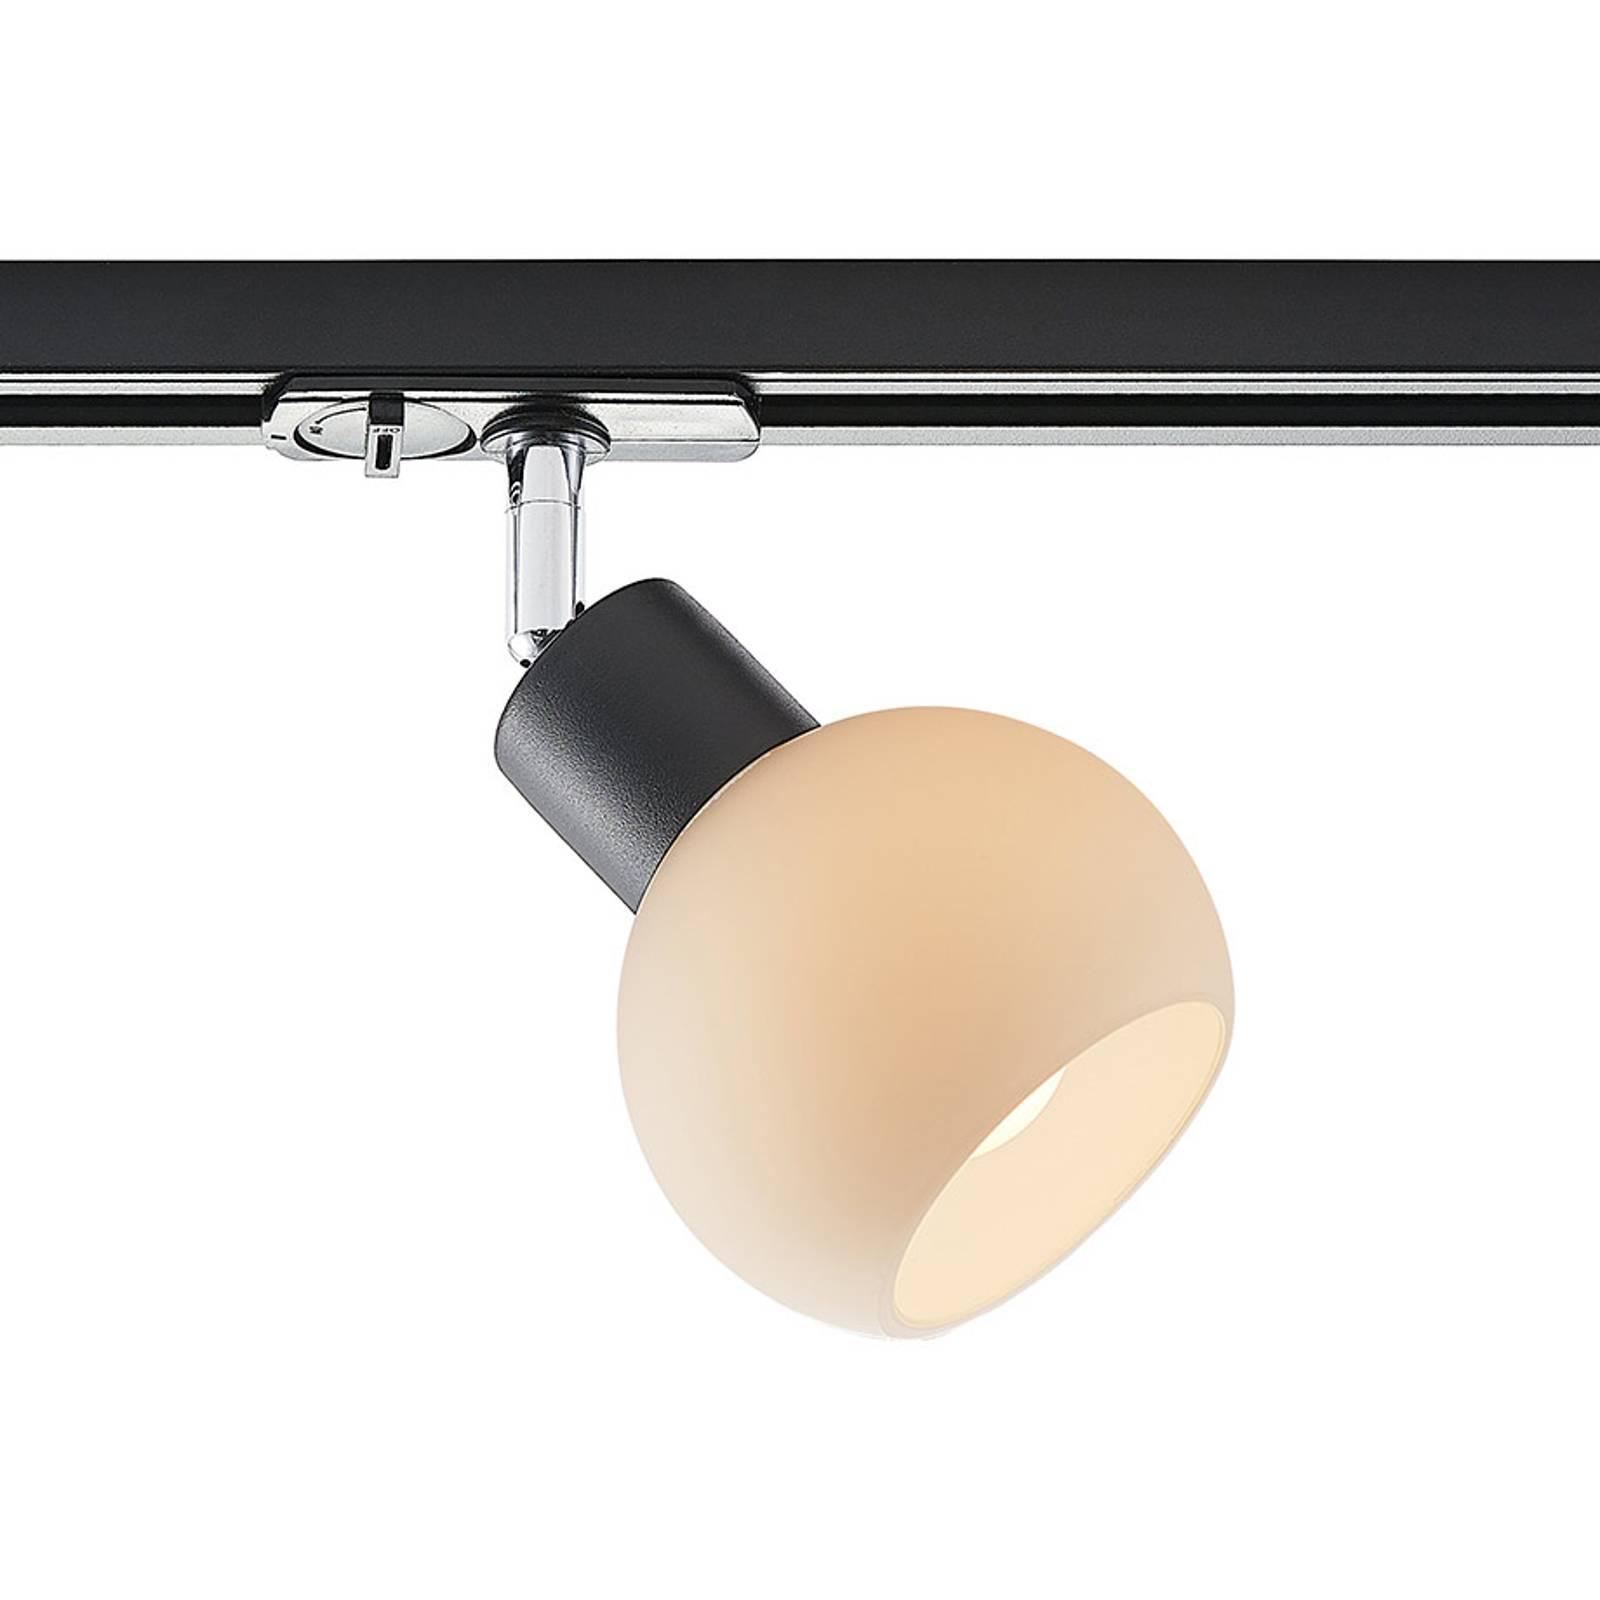 Lindby Maart -LED-spotti 1-vaihekiskoon, musta